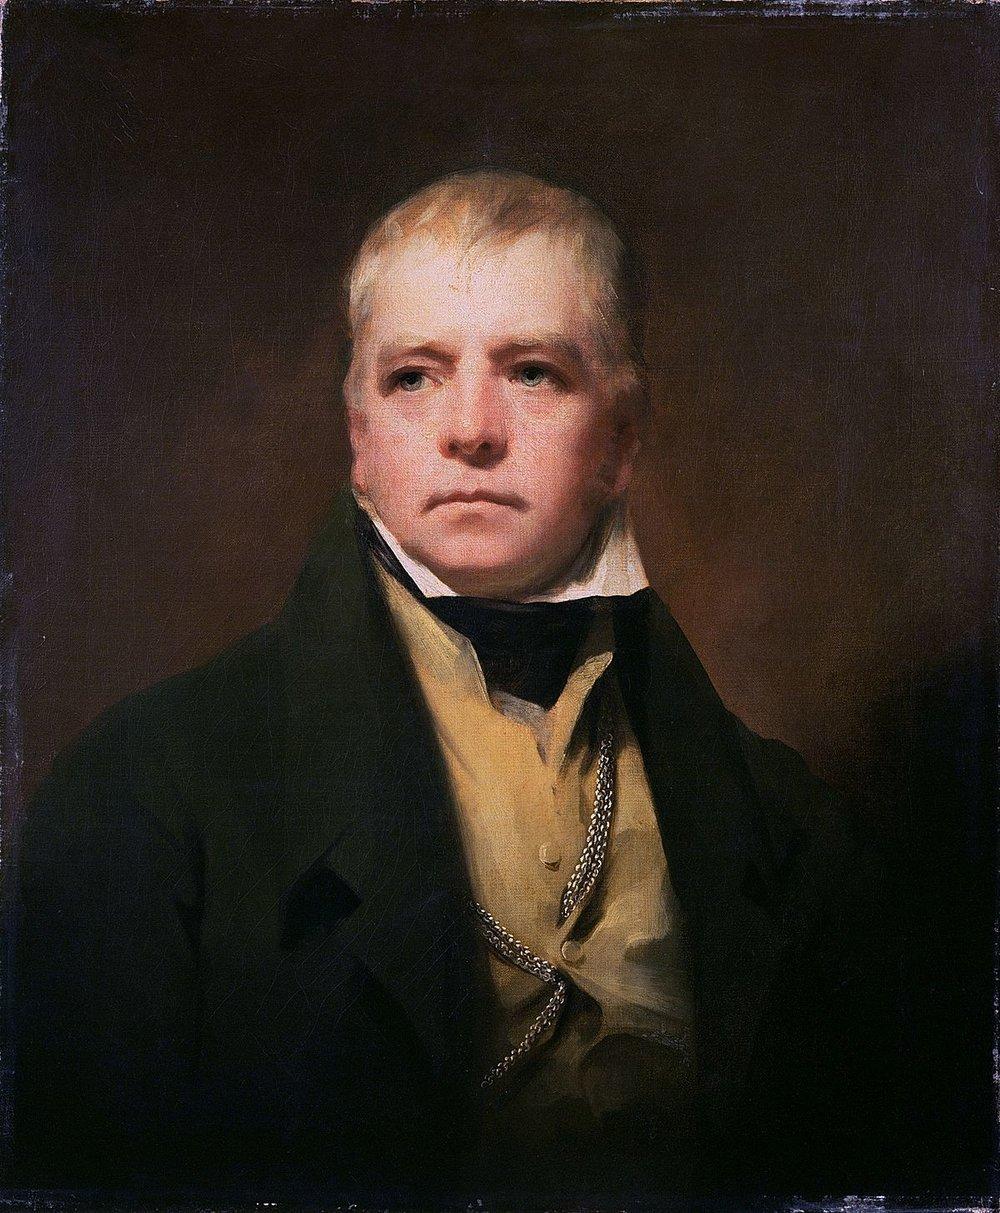 Sir Walter Scott (1771-1832)